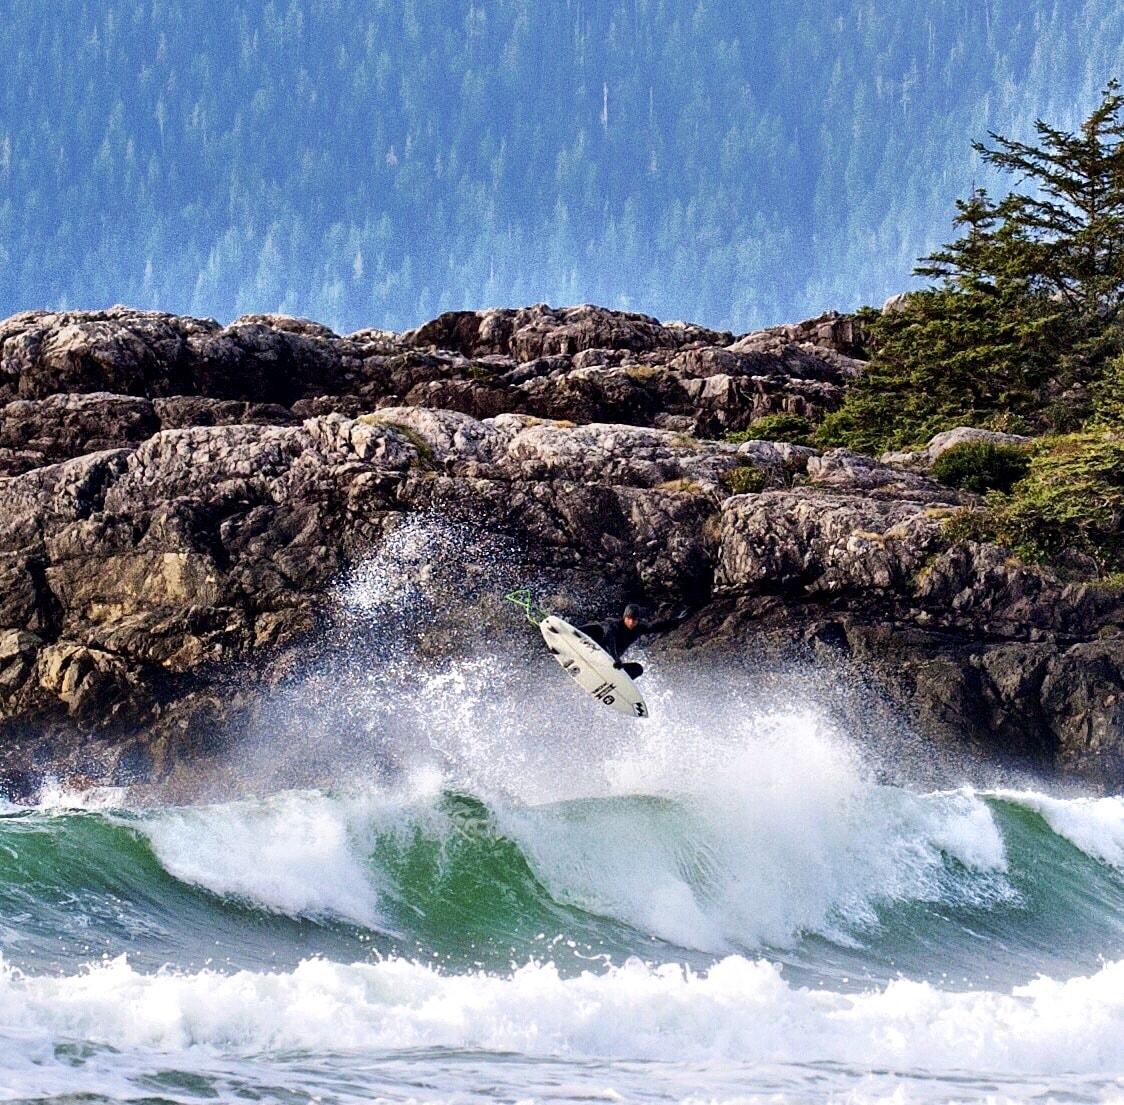 Surfing Canada Surf partner